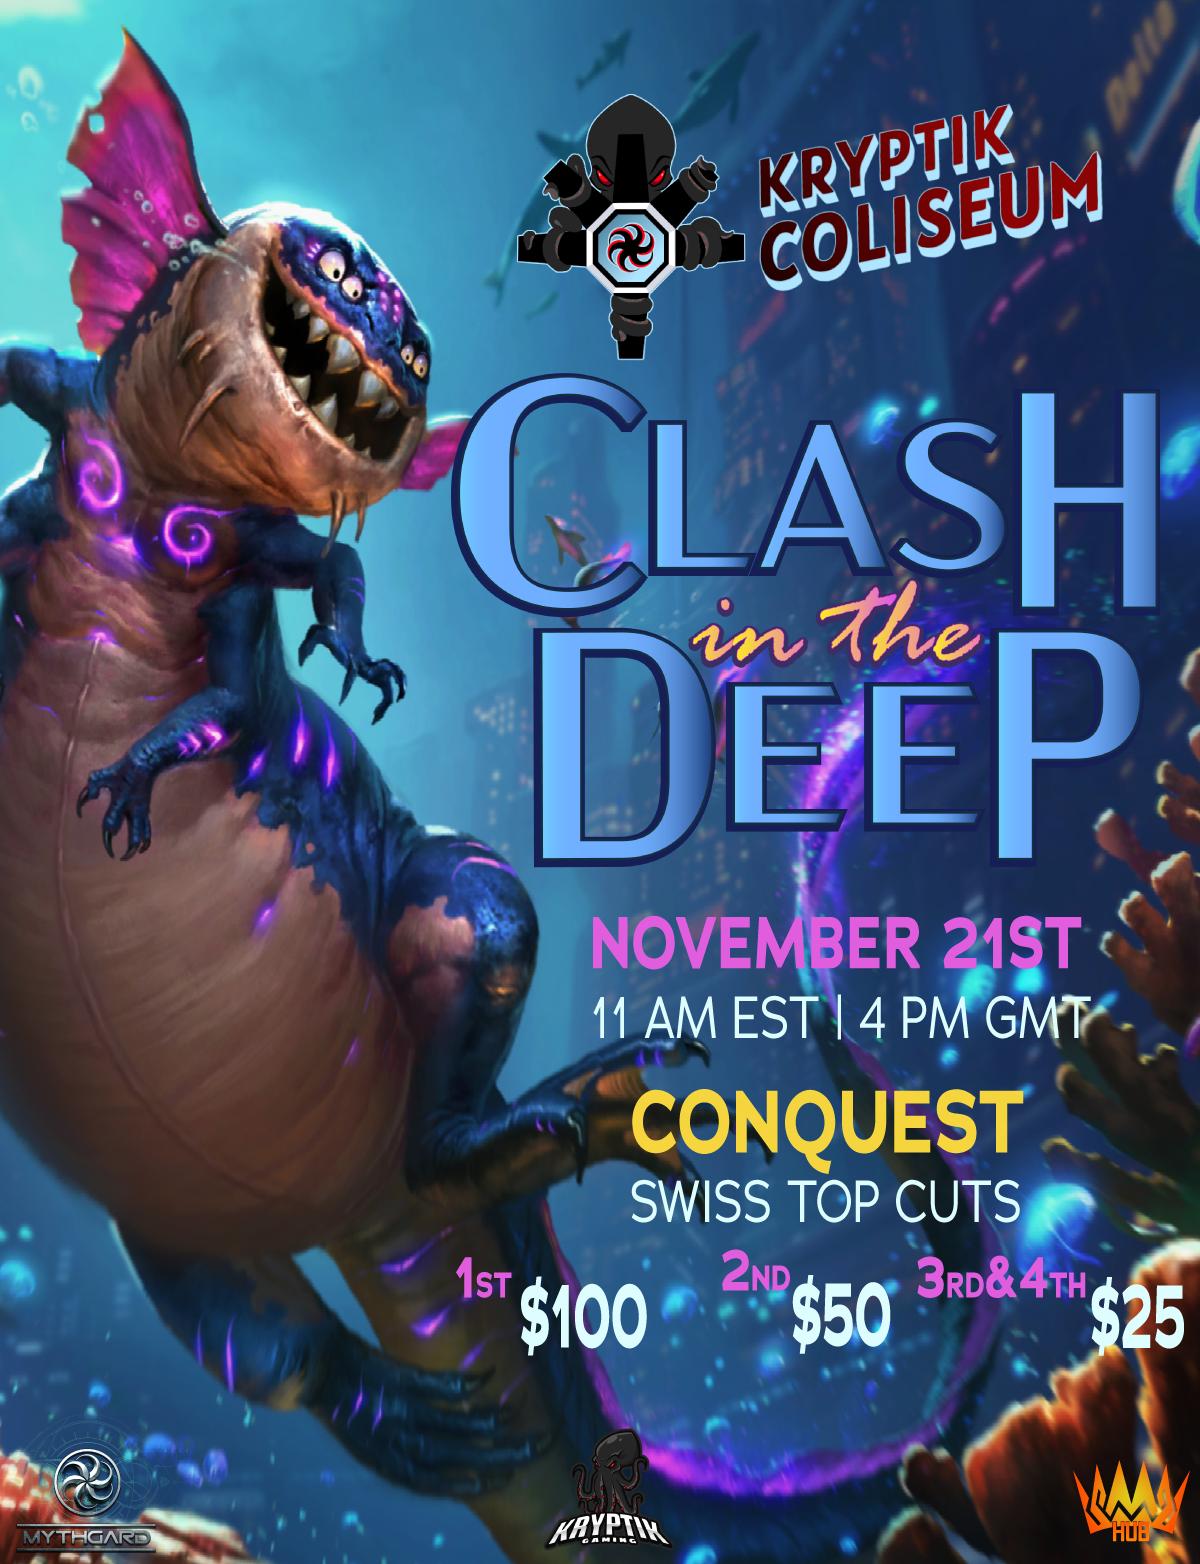 https://cdn.discordapp.com/attachments/482997641383247893/773625265100030072/Clash_in_the_deep_poster.png